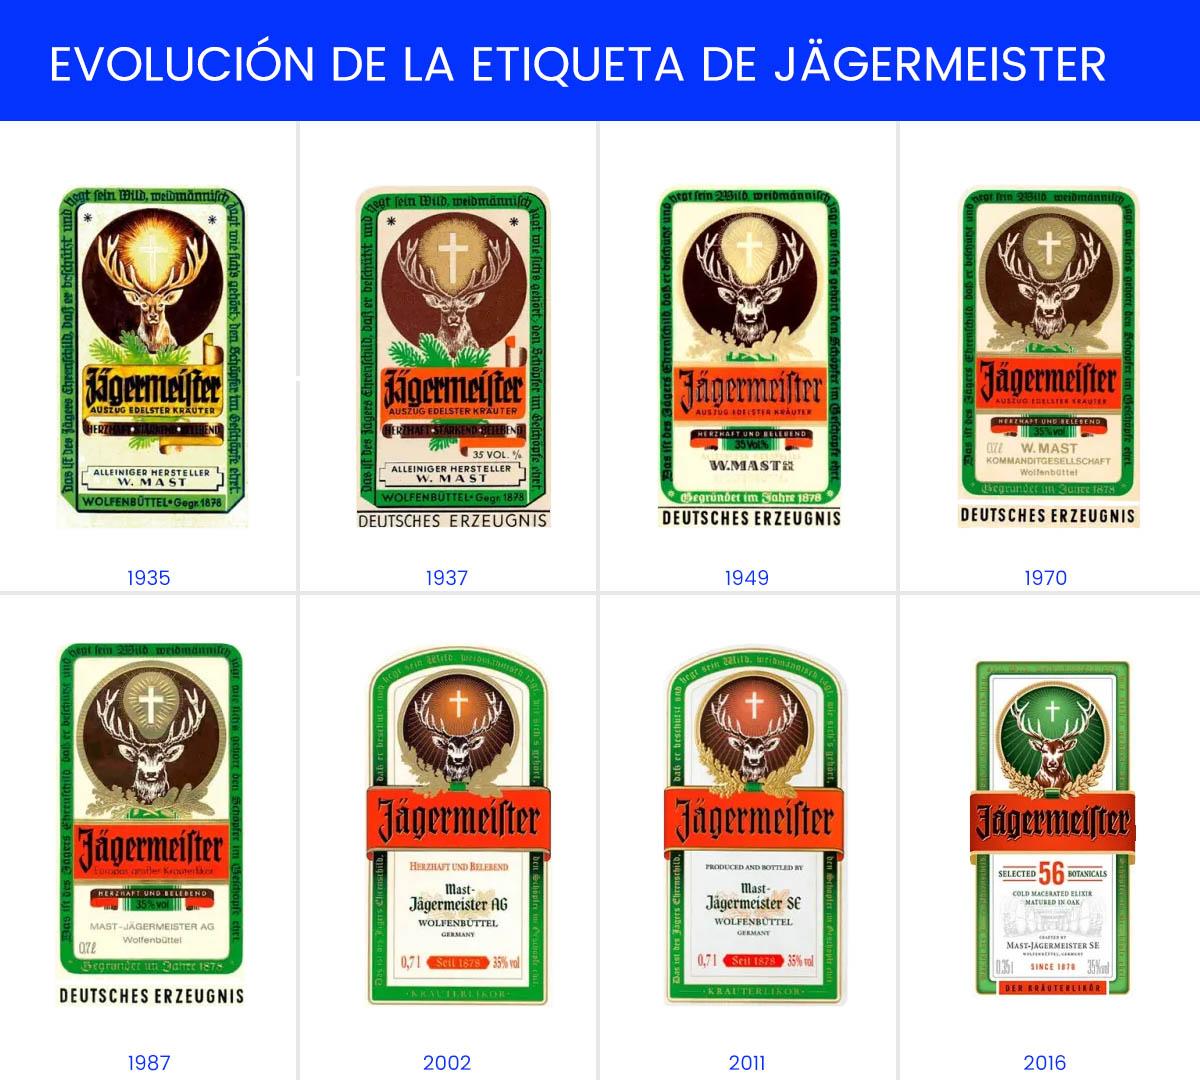 Evolución de la etiqueta de Jägermeister